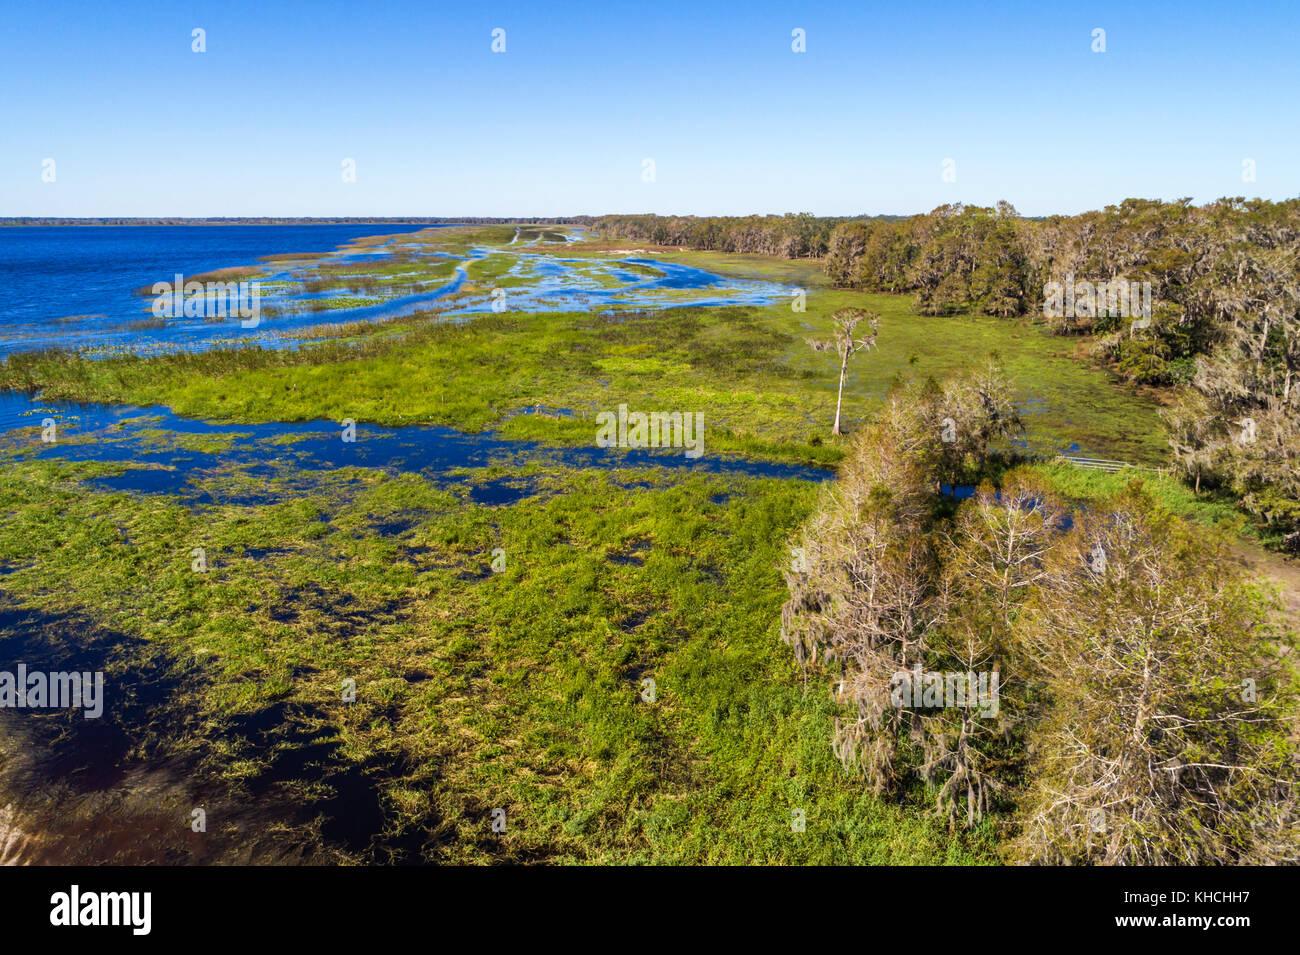 Florida Kenansville Cypress Lake water shore trees aerial overhead bird's eye view above - Stock Image